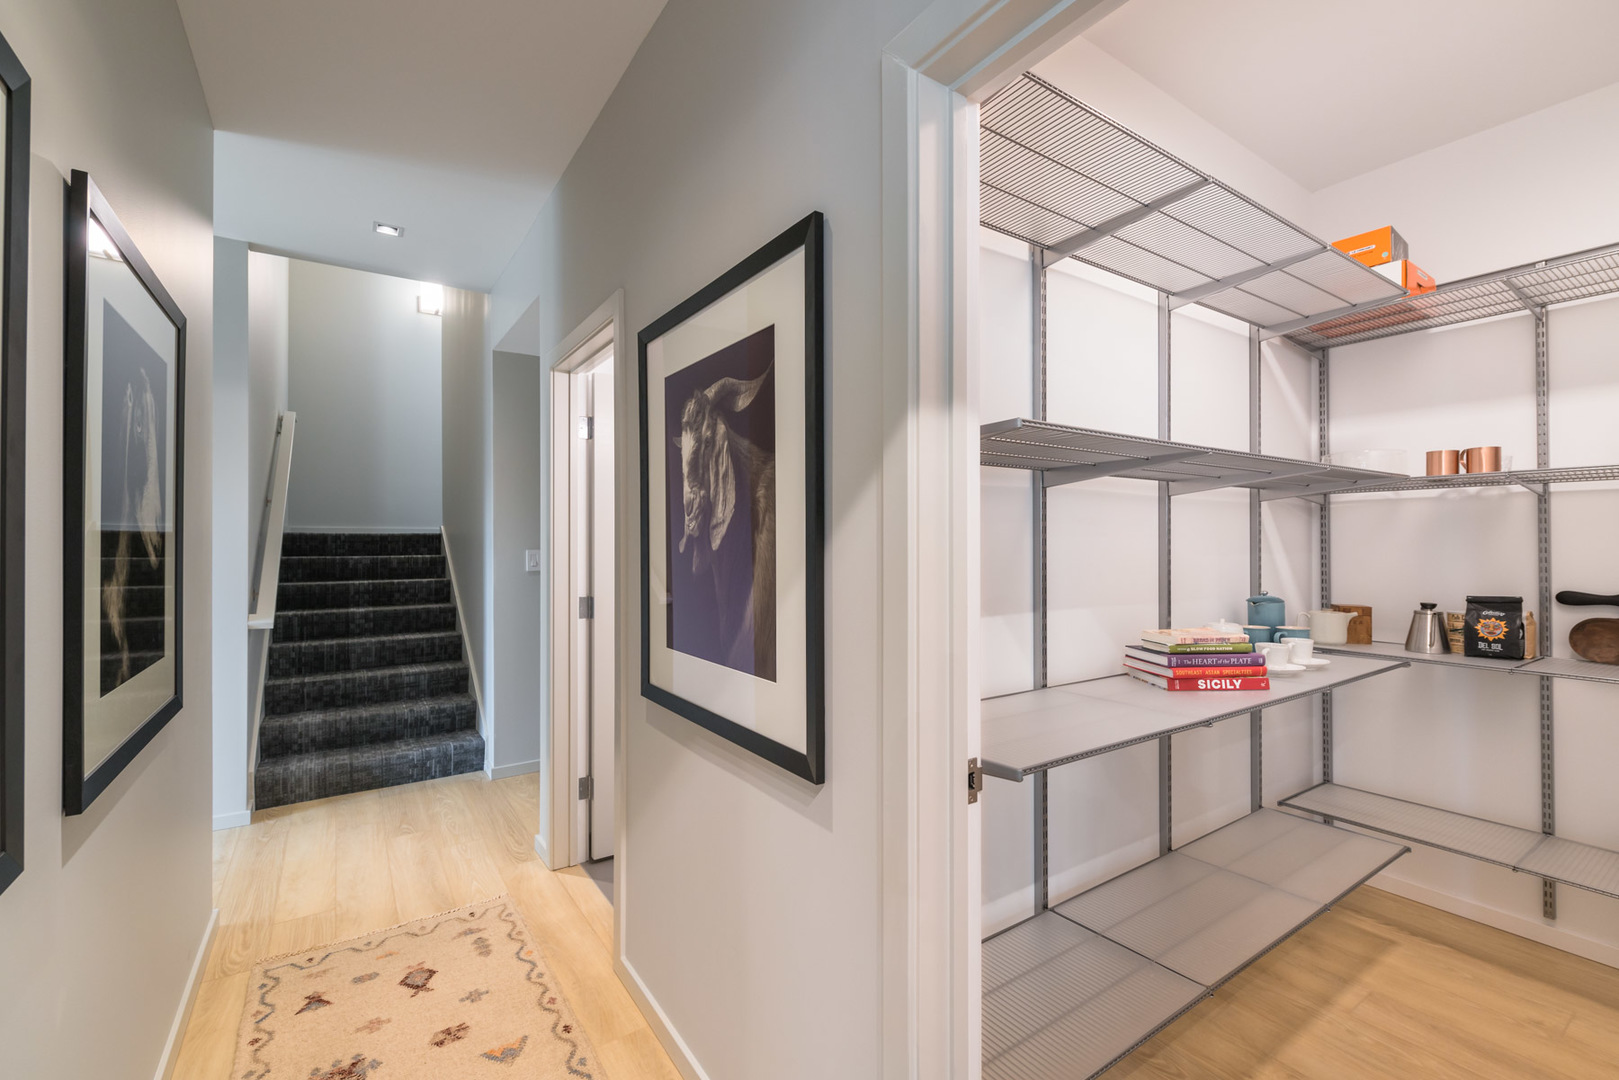 1205 N Damen Ave apartments for rent at AptAmigo